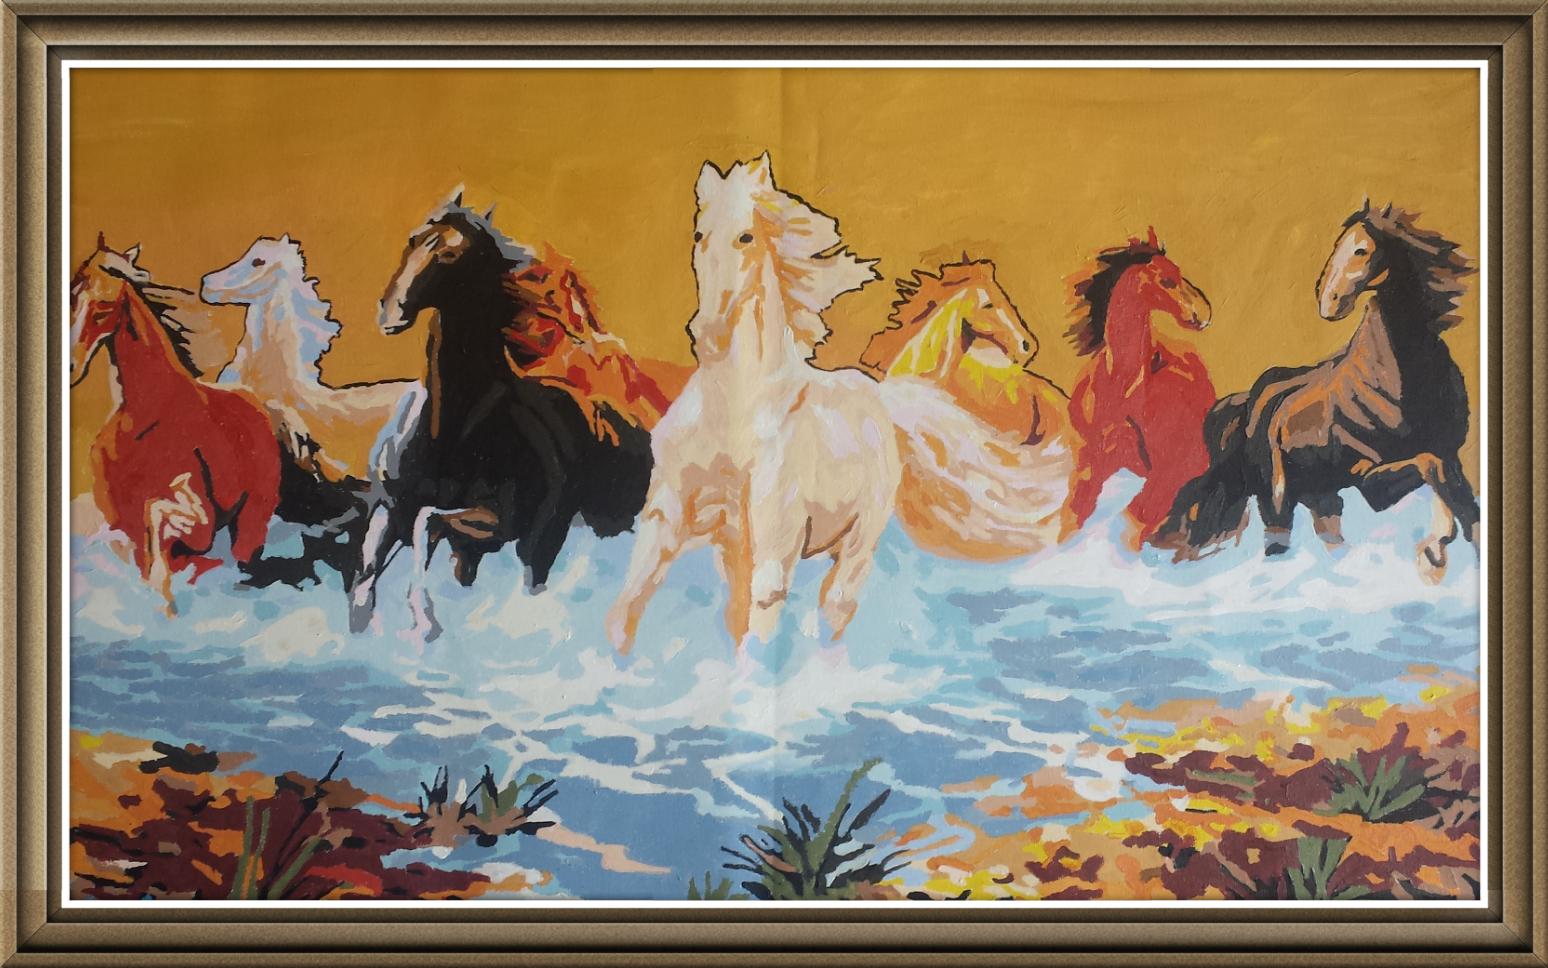 8 horses